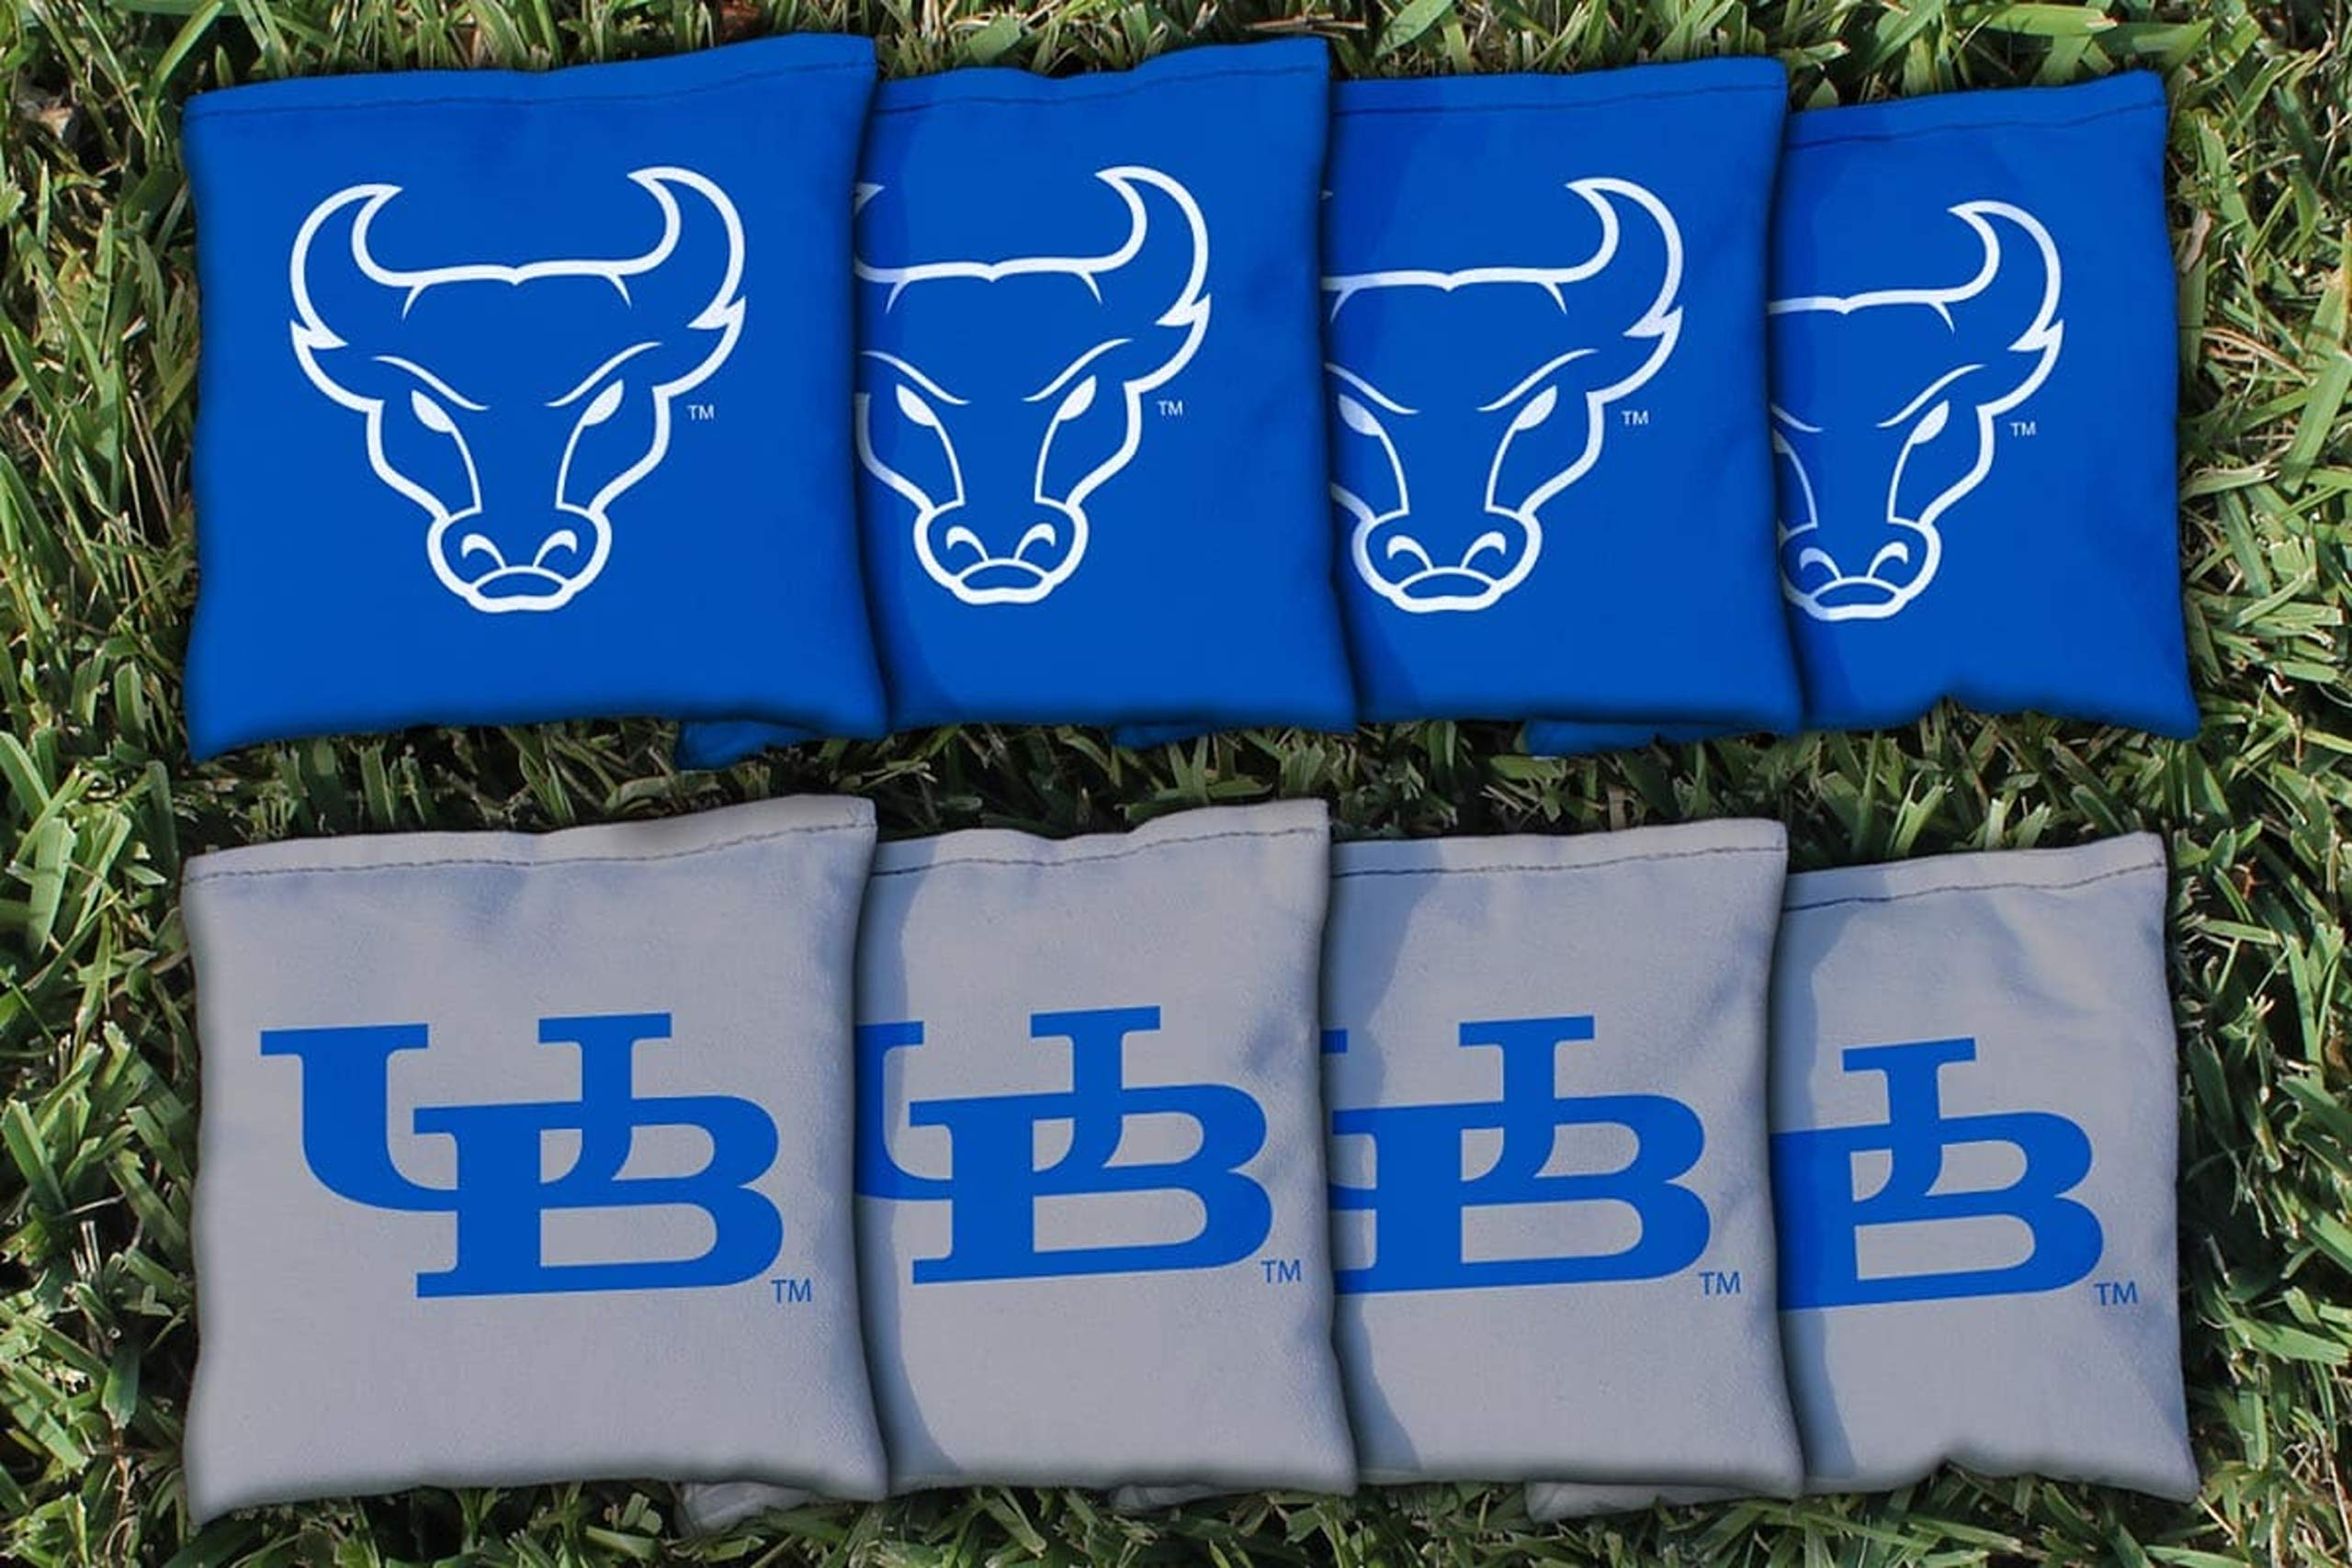 Victory Tailgate NCAA Regulation Cornhole Game Bag Set (8 Bags Included, Corn-Filled) - SUNY - Buffalo Bulls